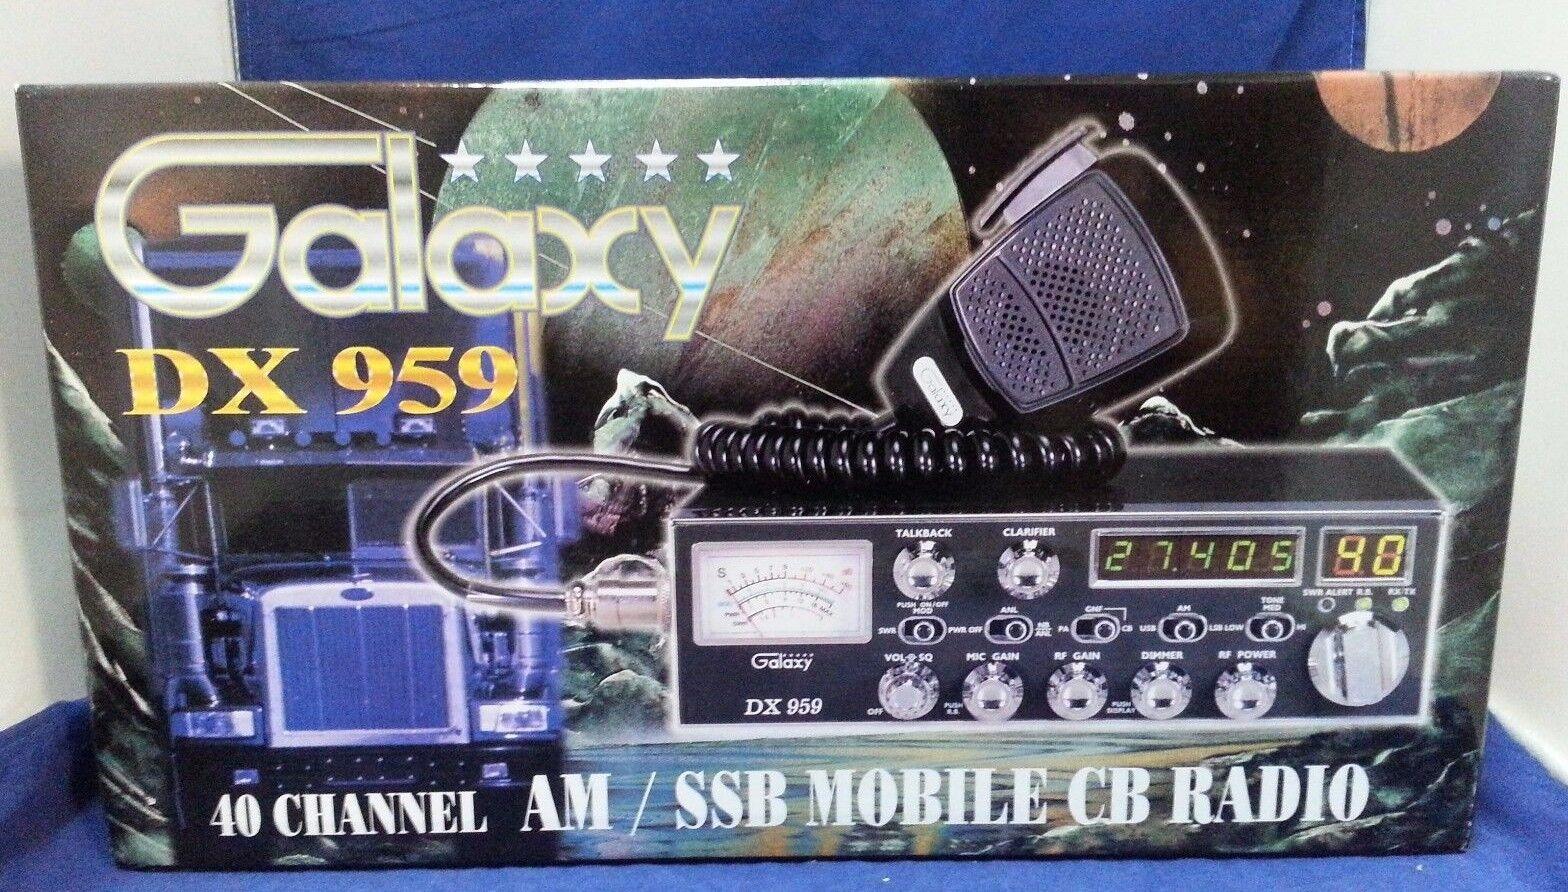 GALAXY DX-959-Blue Light Edition -Same As 959 + Blue lights